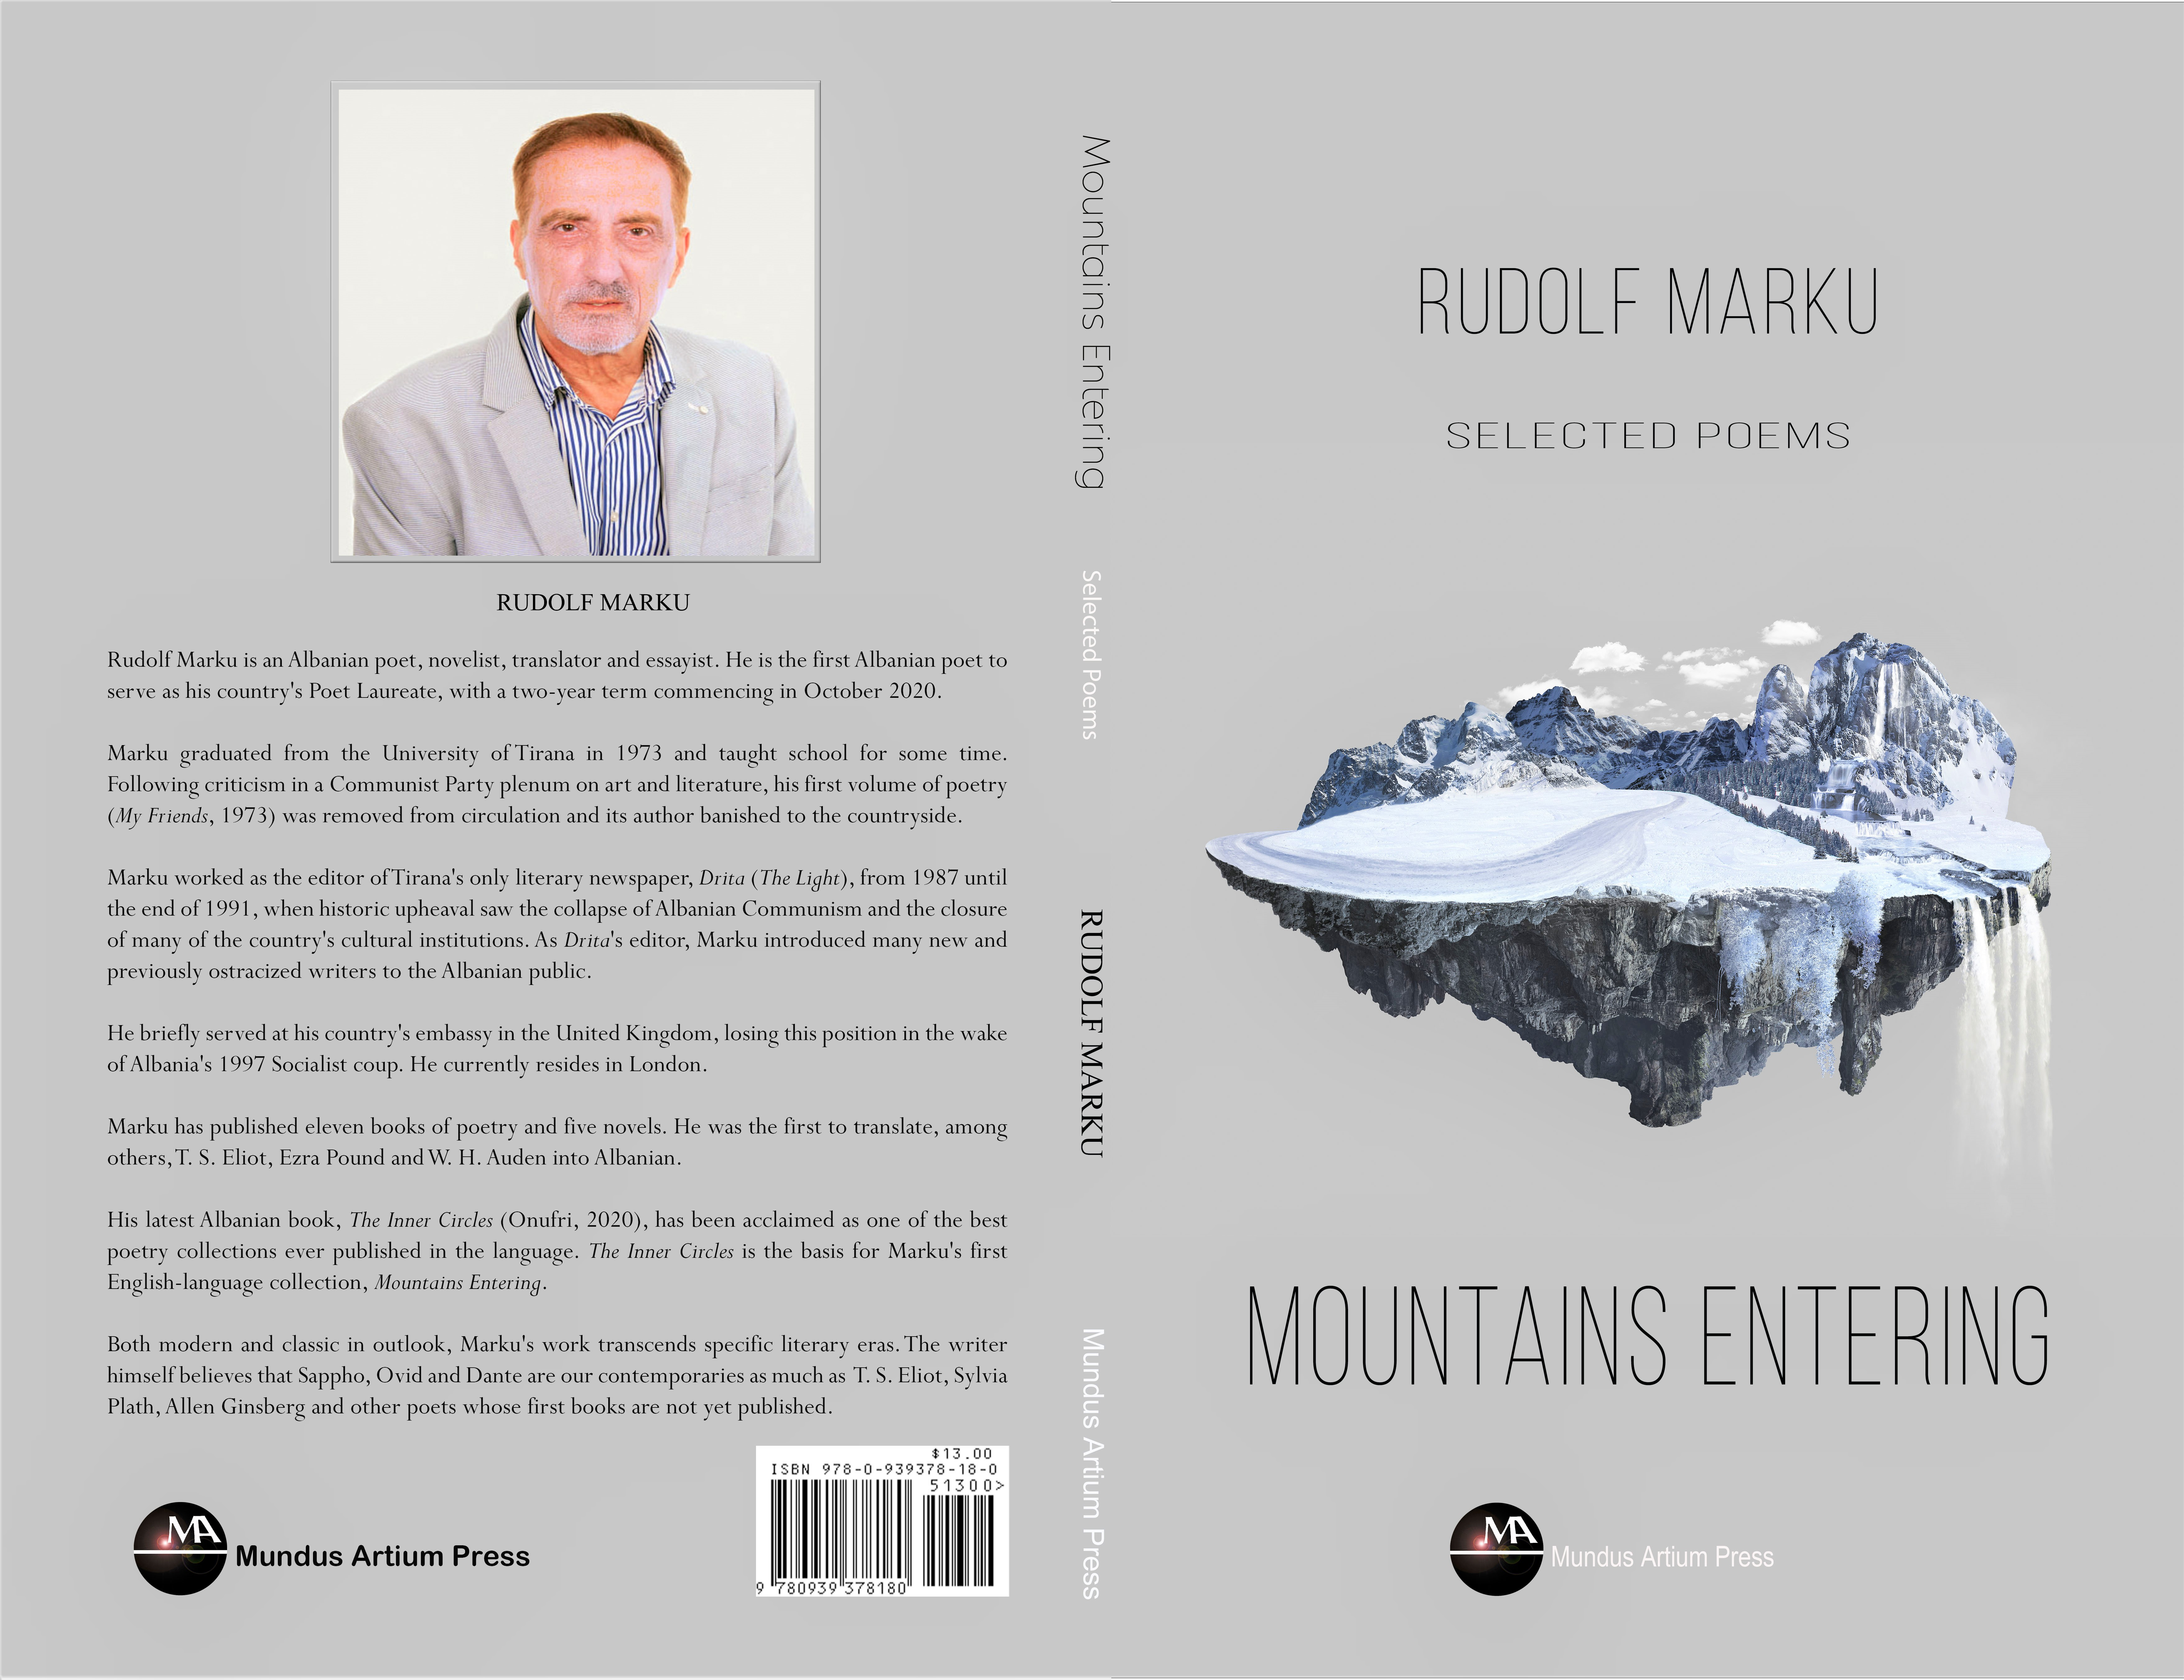 New from Mundus Artium Press: Albanian Laureate Channels Mountains, Seas, Legacies